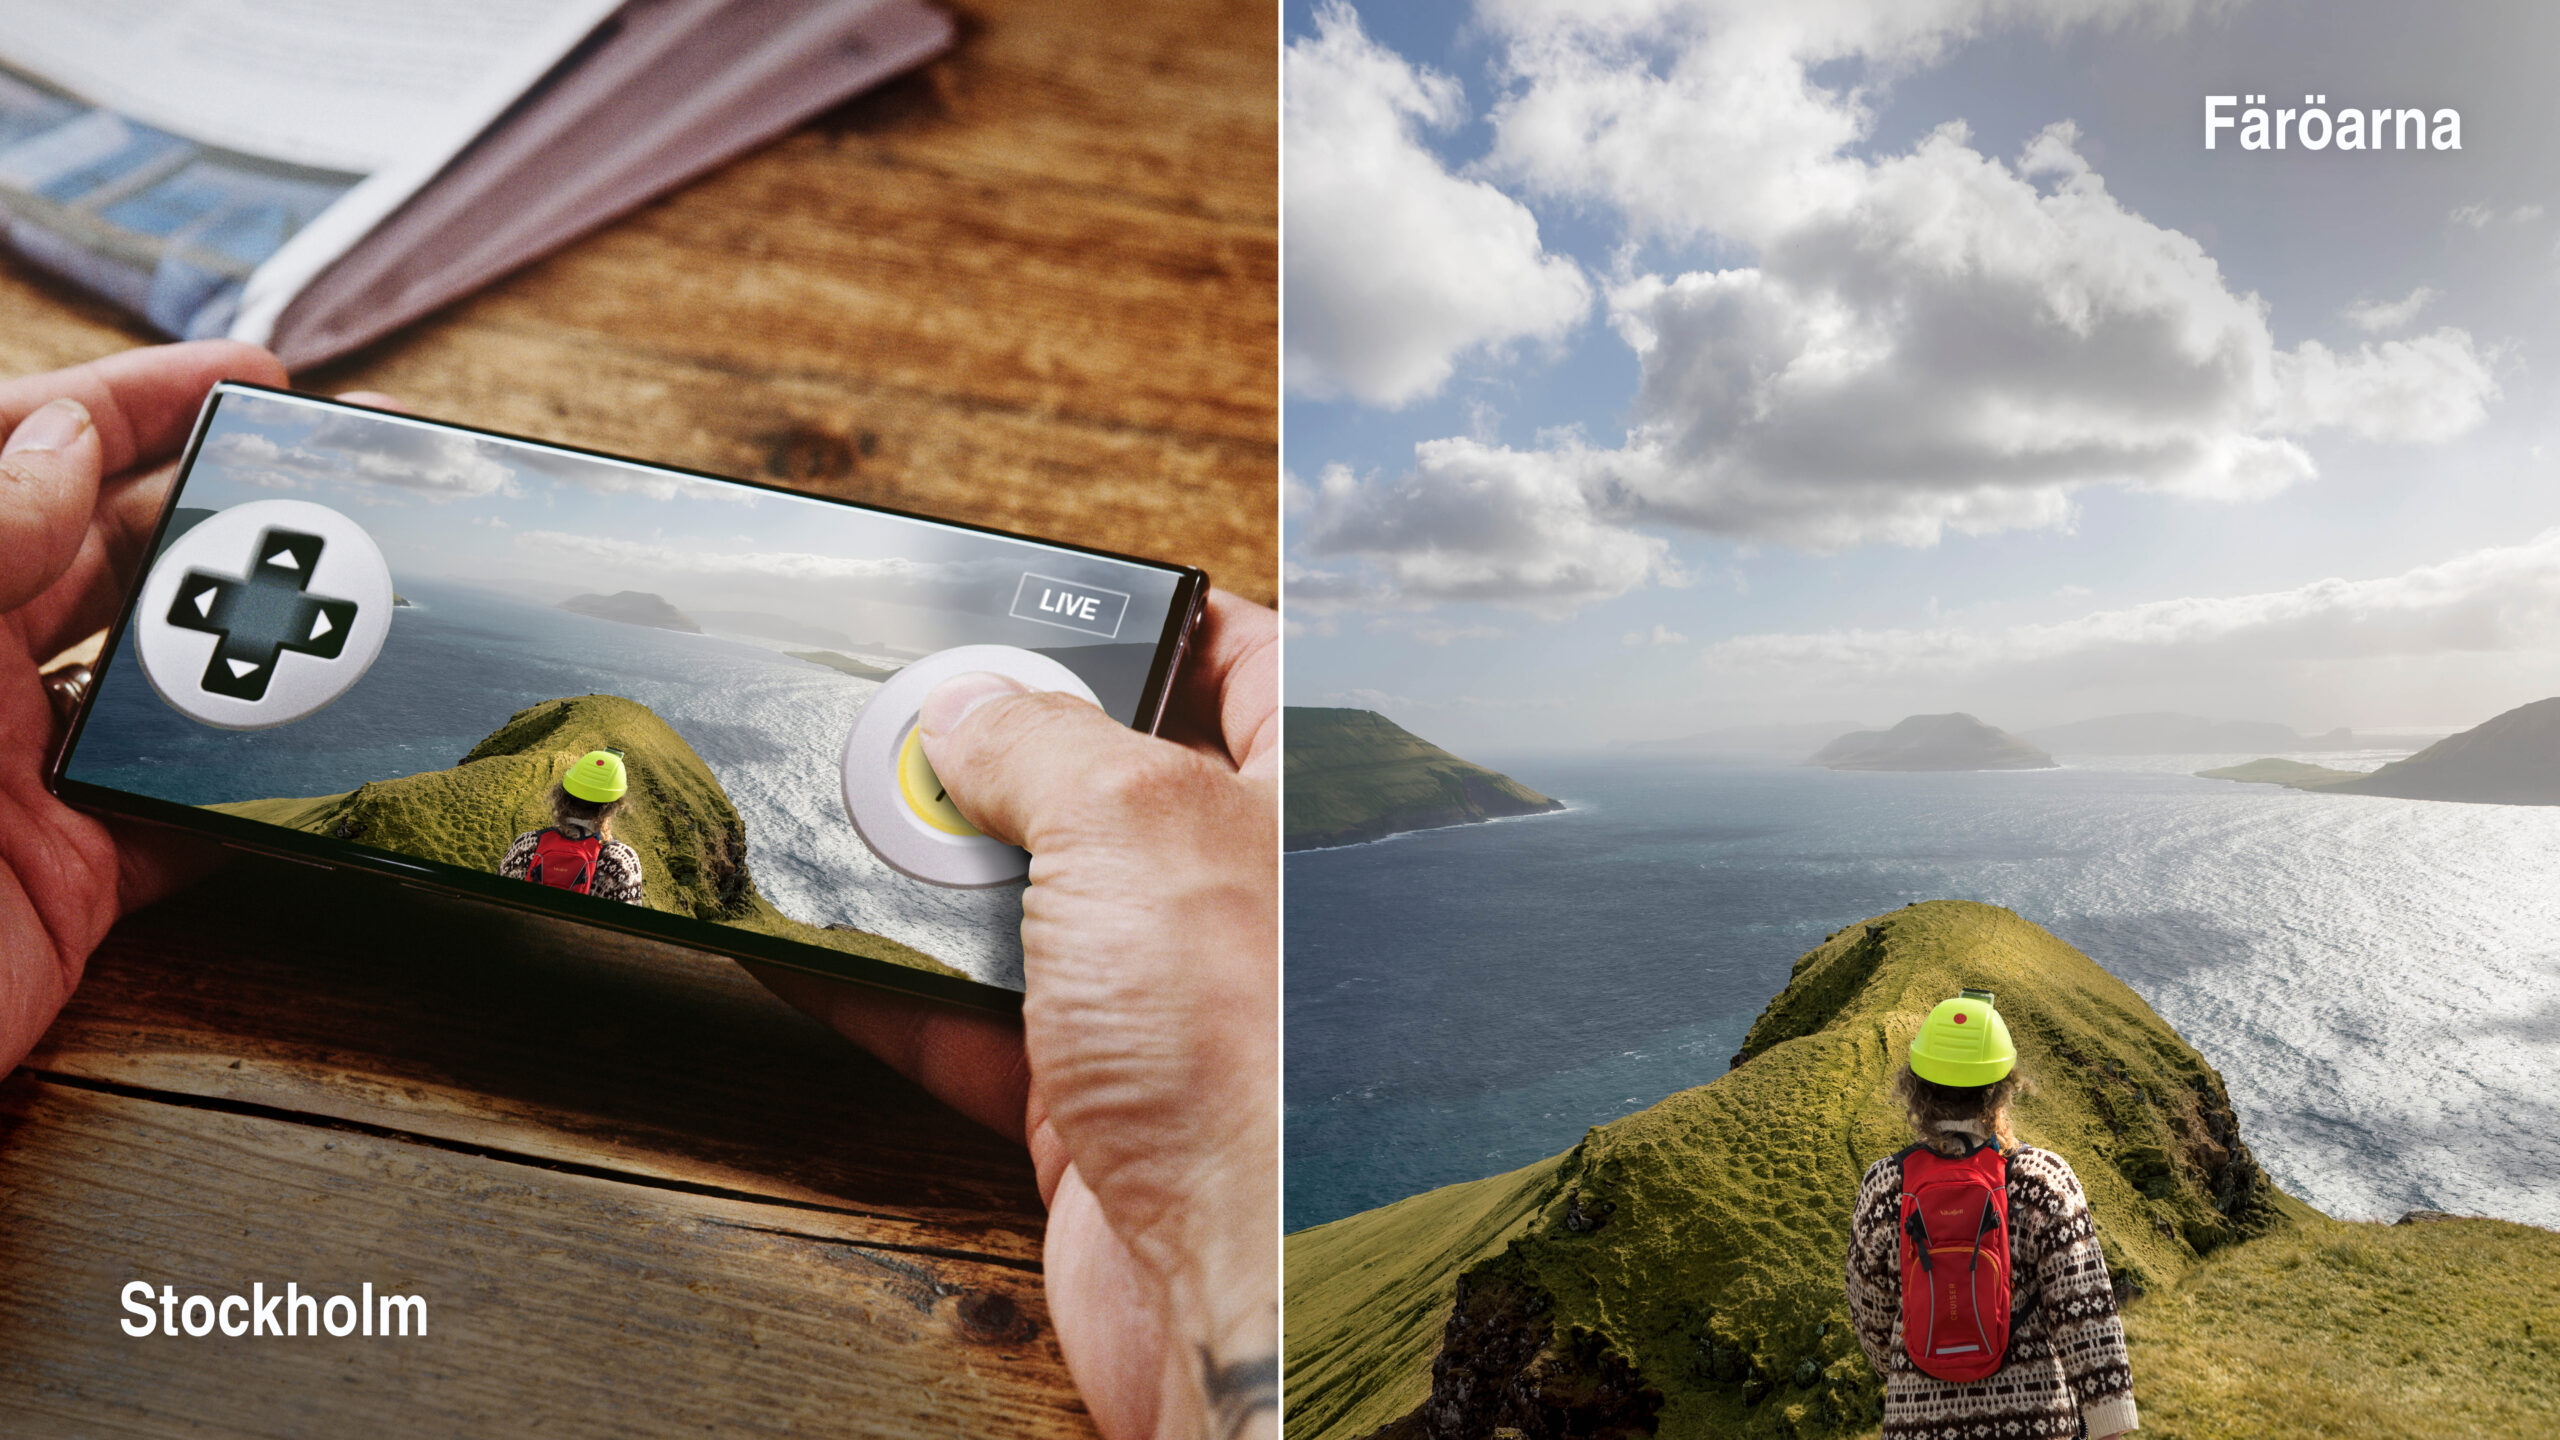 Faore Islands virtual tourism